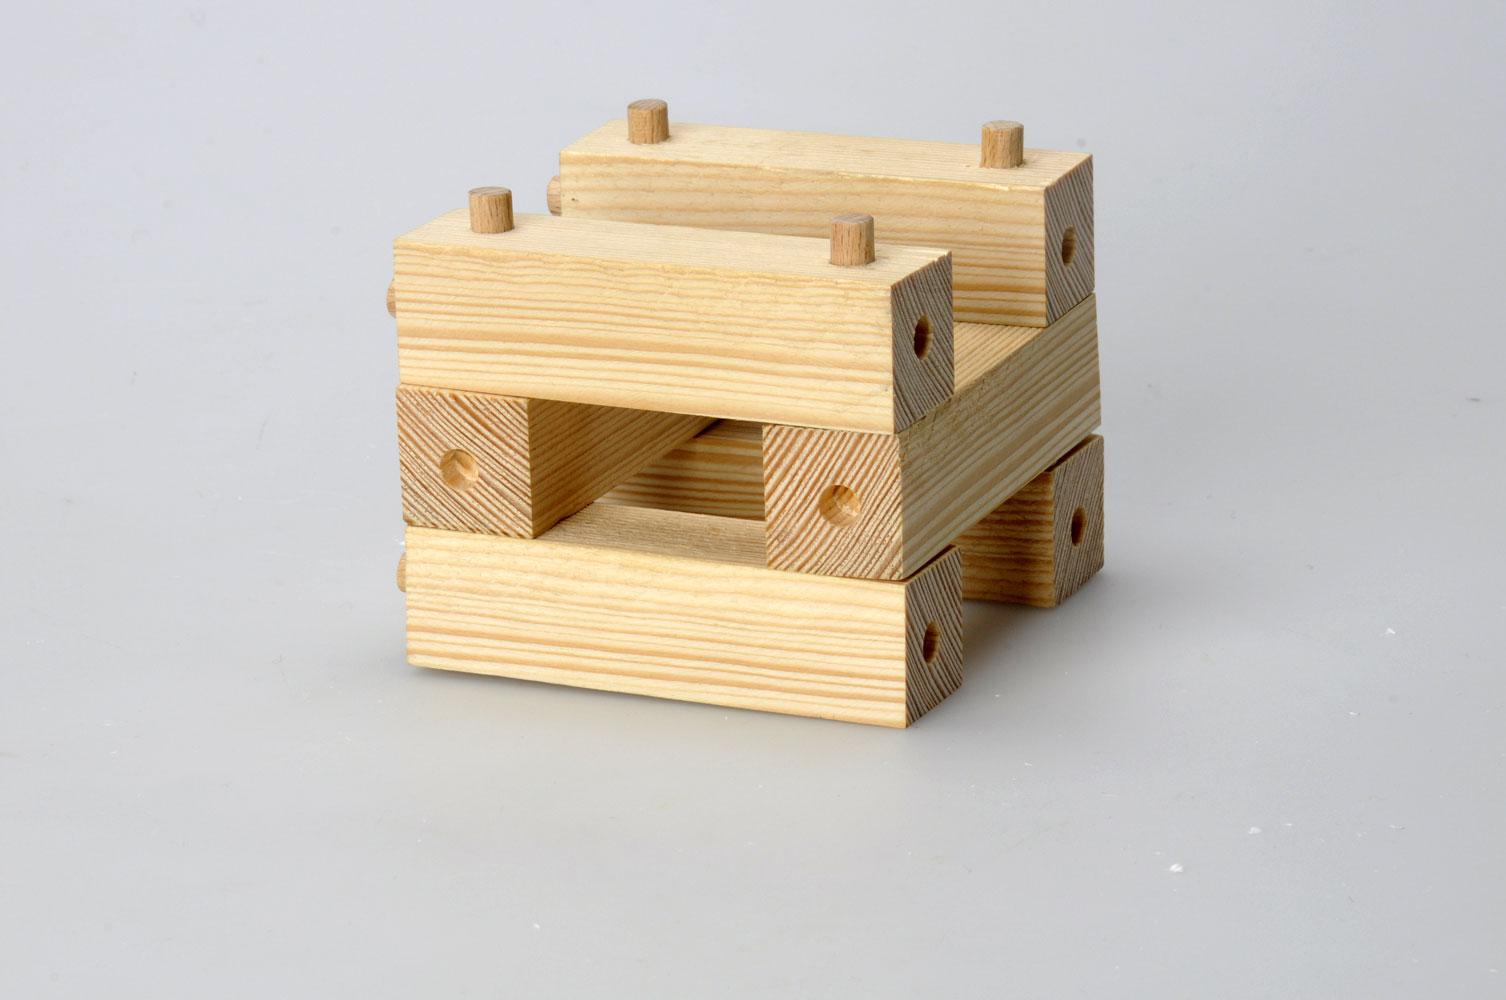 Dice_wood_01